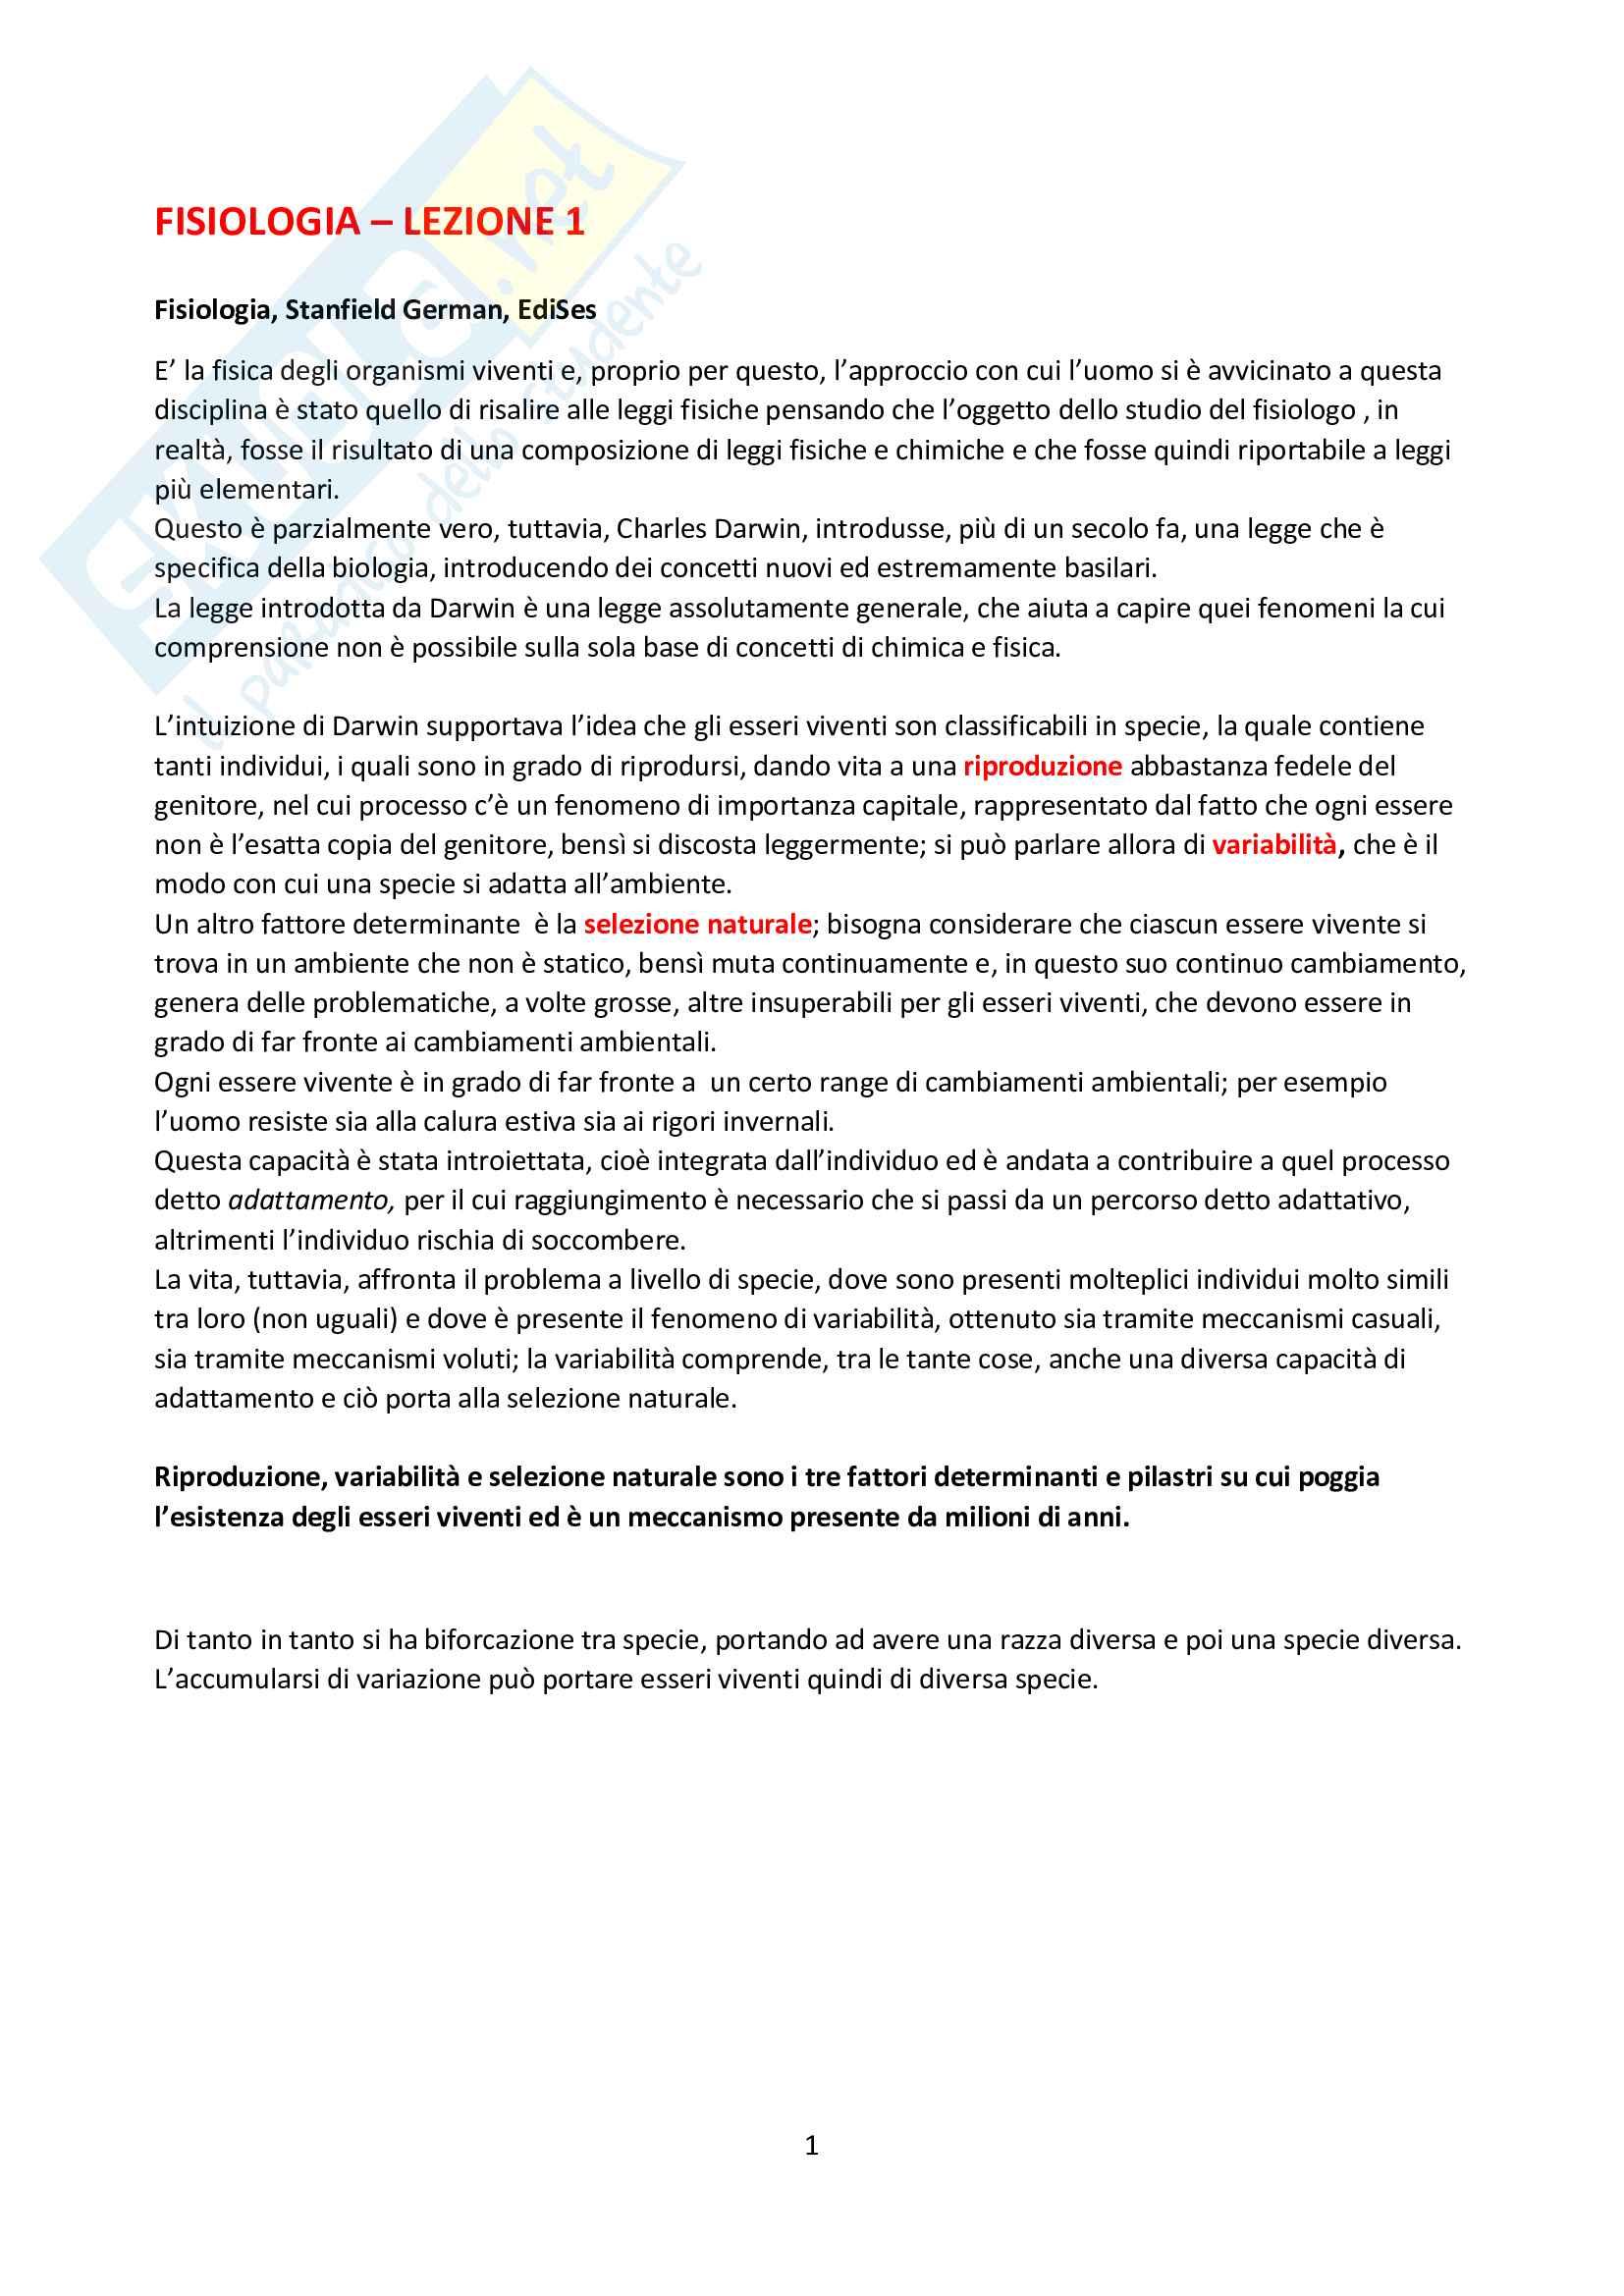 Fisiologia umana - Formenti e Brambilla Pag. 1